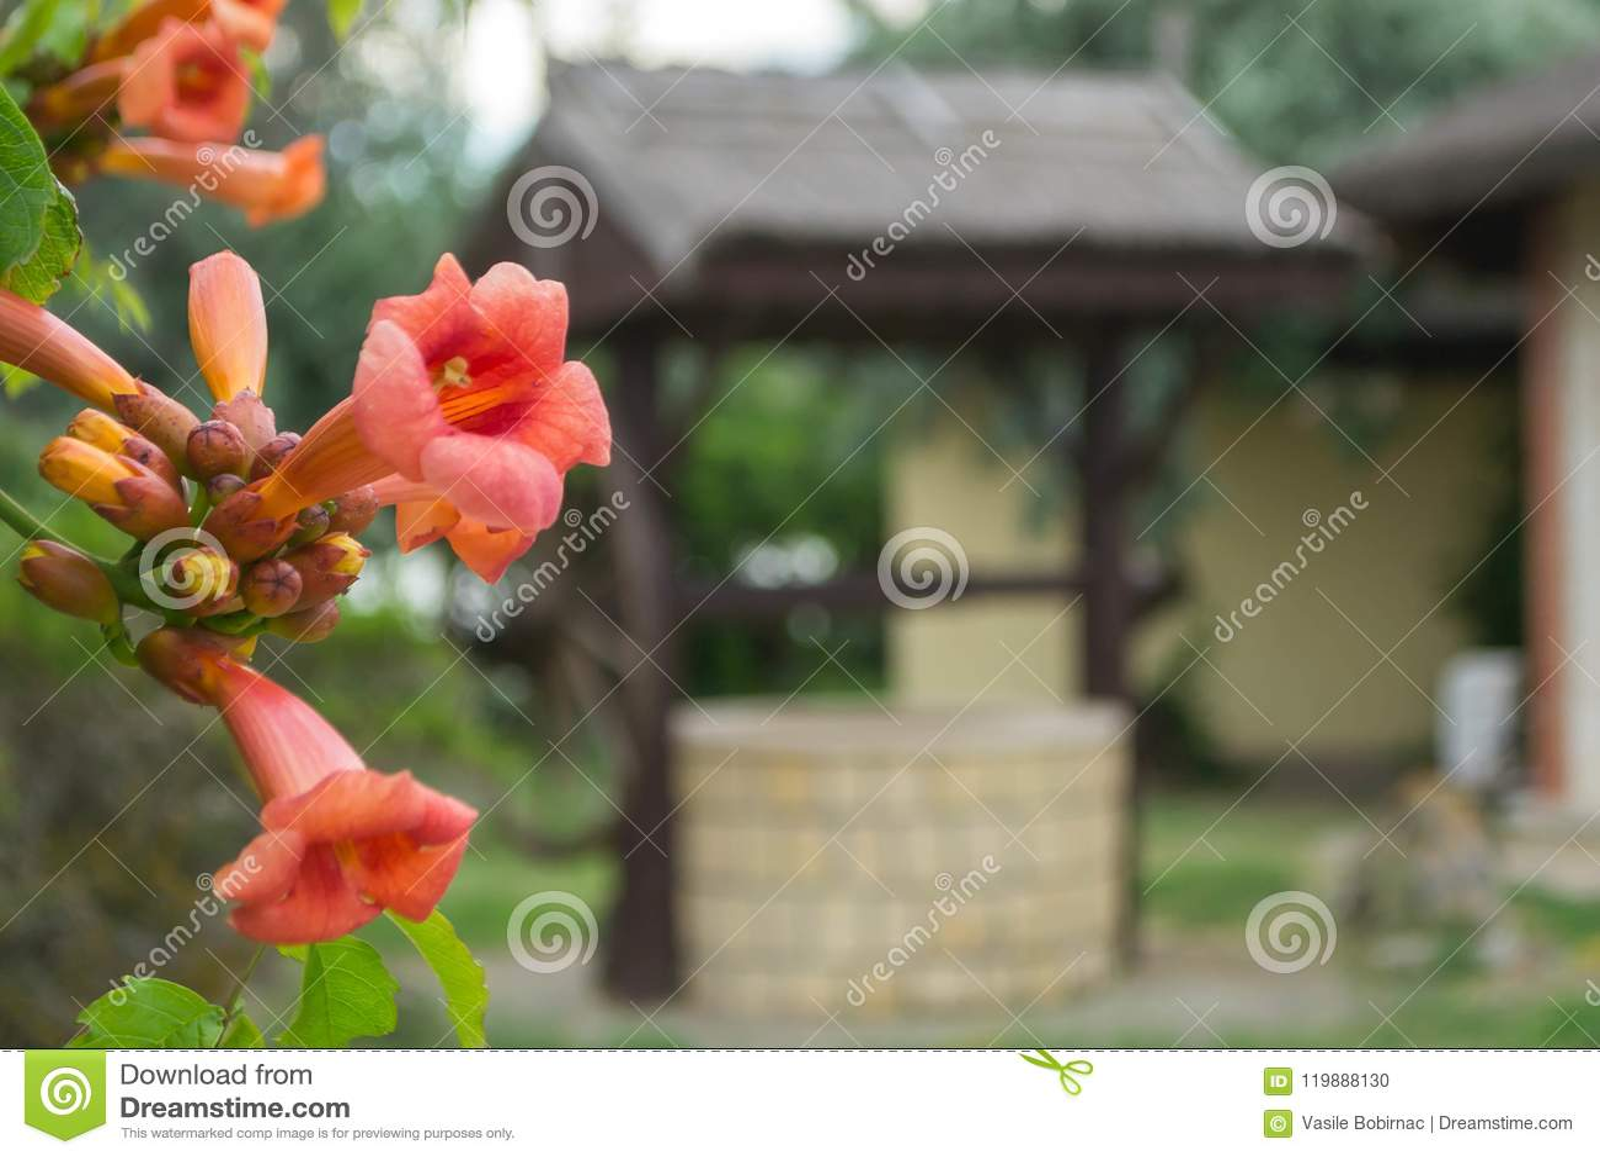 Plante grimpante de trompette